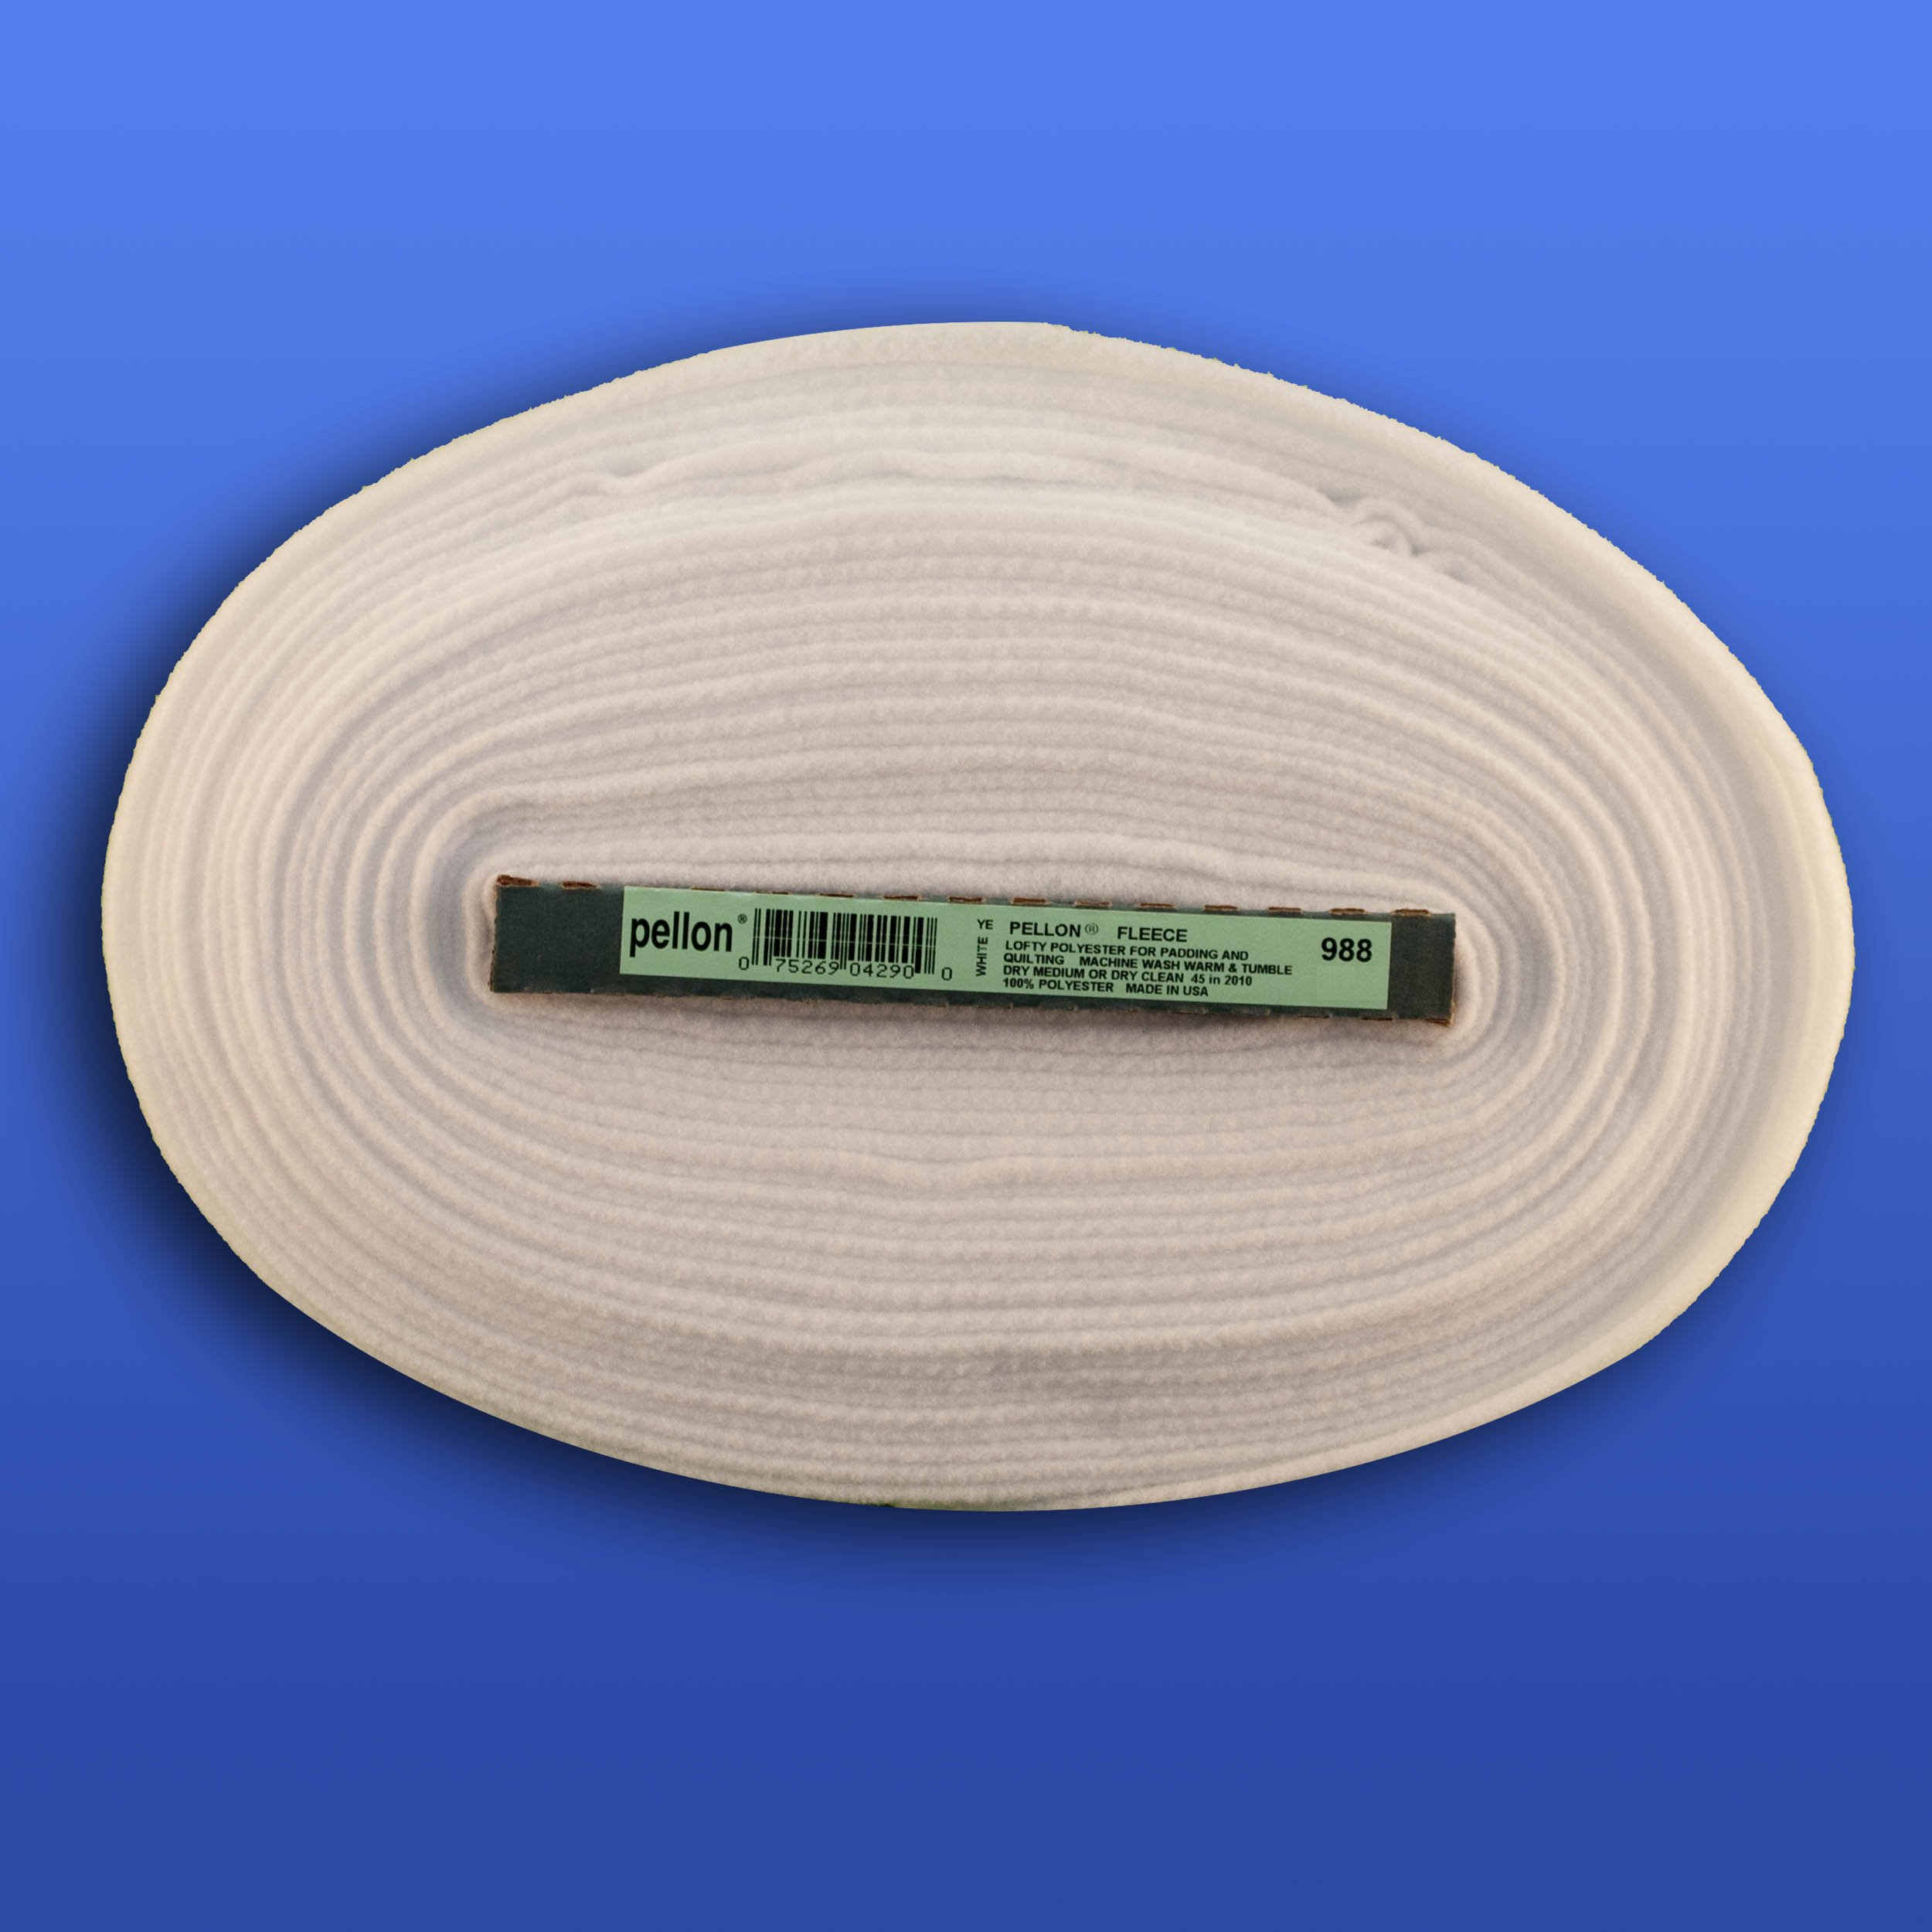 Pellon Sew-in Fleece 44'' X20yds-White by Pellon